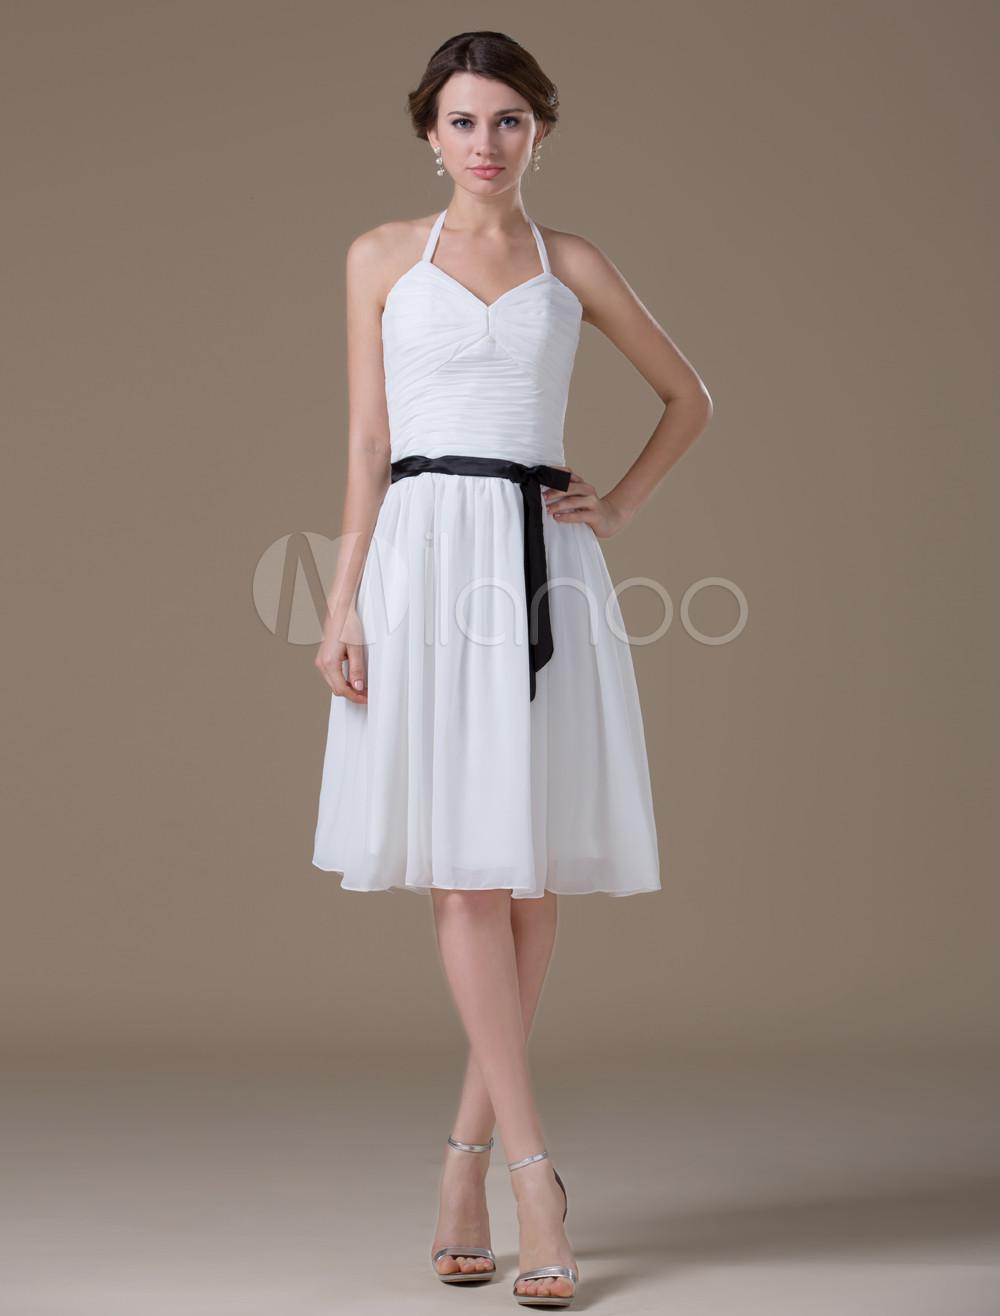 Sweet White Chiffon Black Sash A-line Womens Evening Dress (Wedding) photo